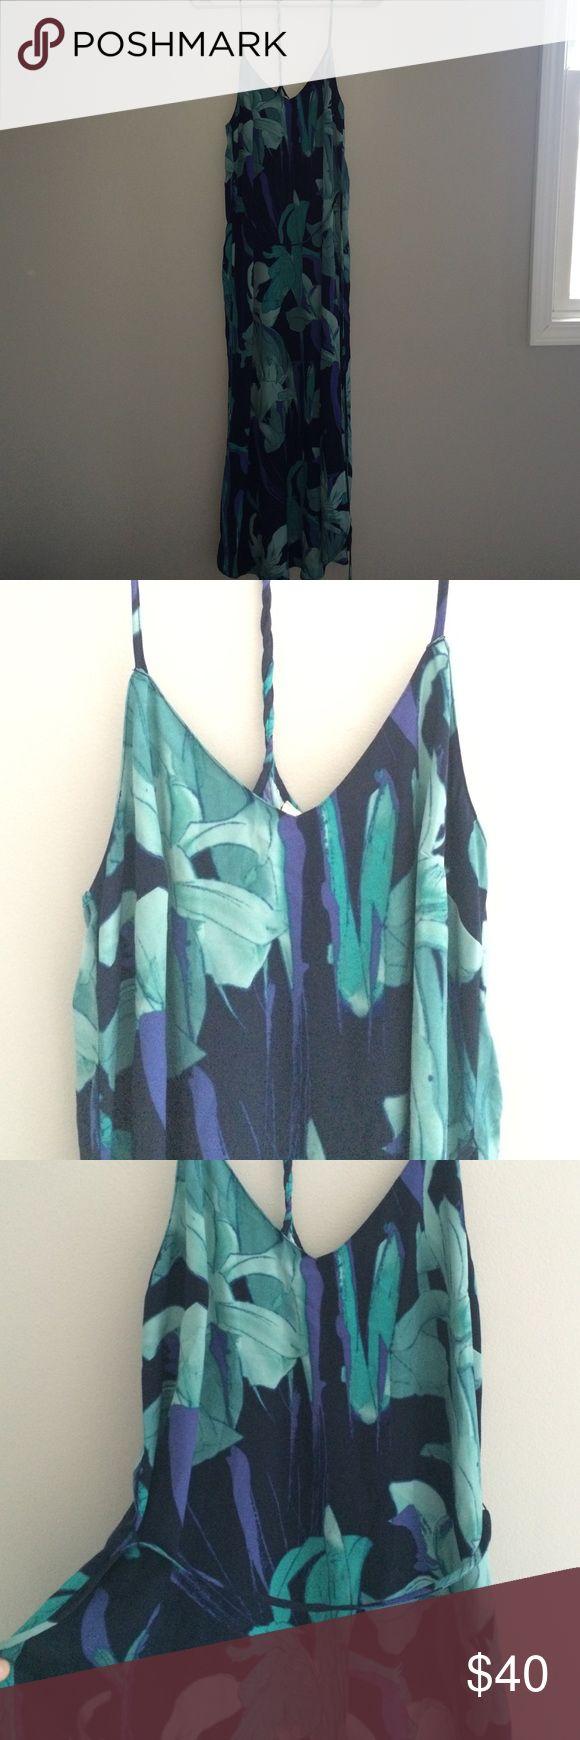 Loft Ann Taylor midi Summer dress Never worn new with tags! No trades, make an offer! LOFT Dresses Midi